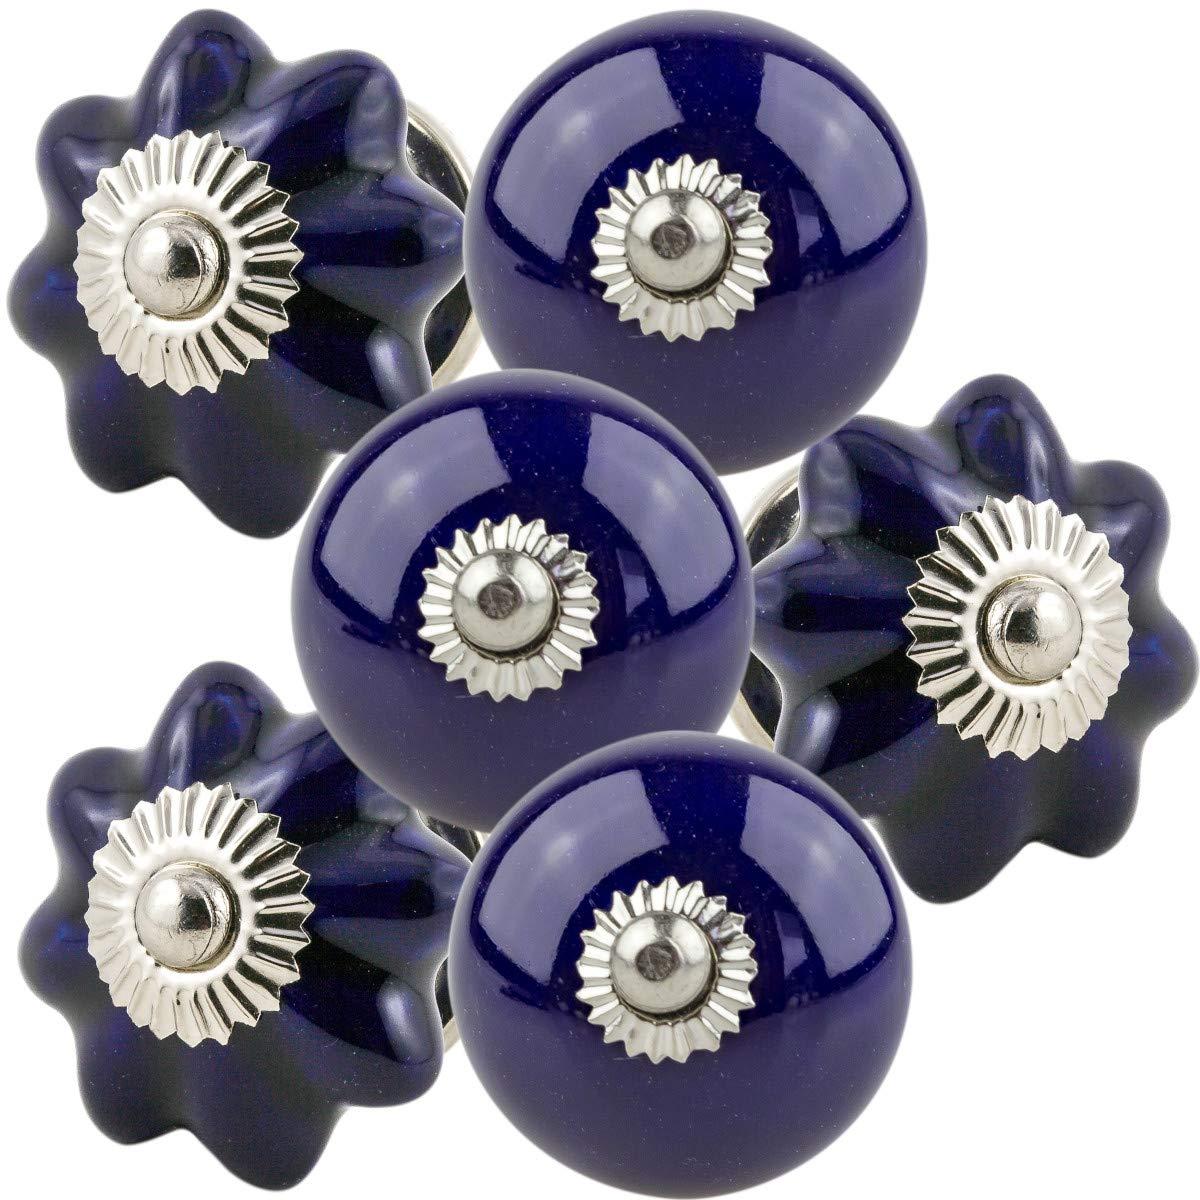 color azul oscuro Tiradores de caj/ón de porcelana pintados a mano Juego de 6 pomos de cer/ámica para muebles 174/_635 pomo de Jay Knopf